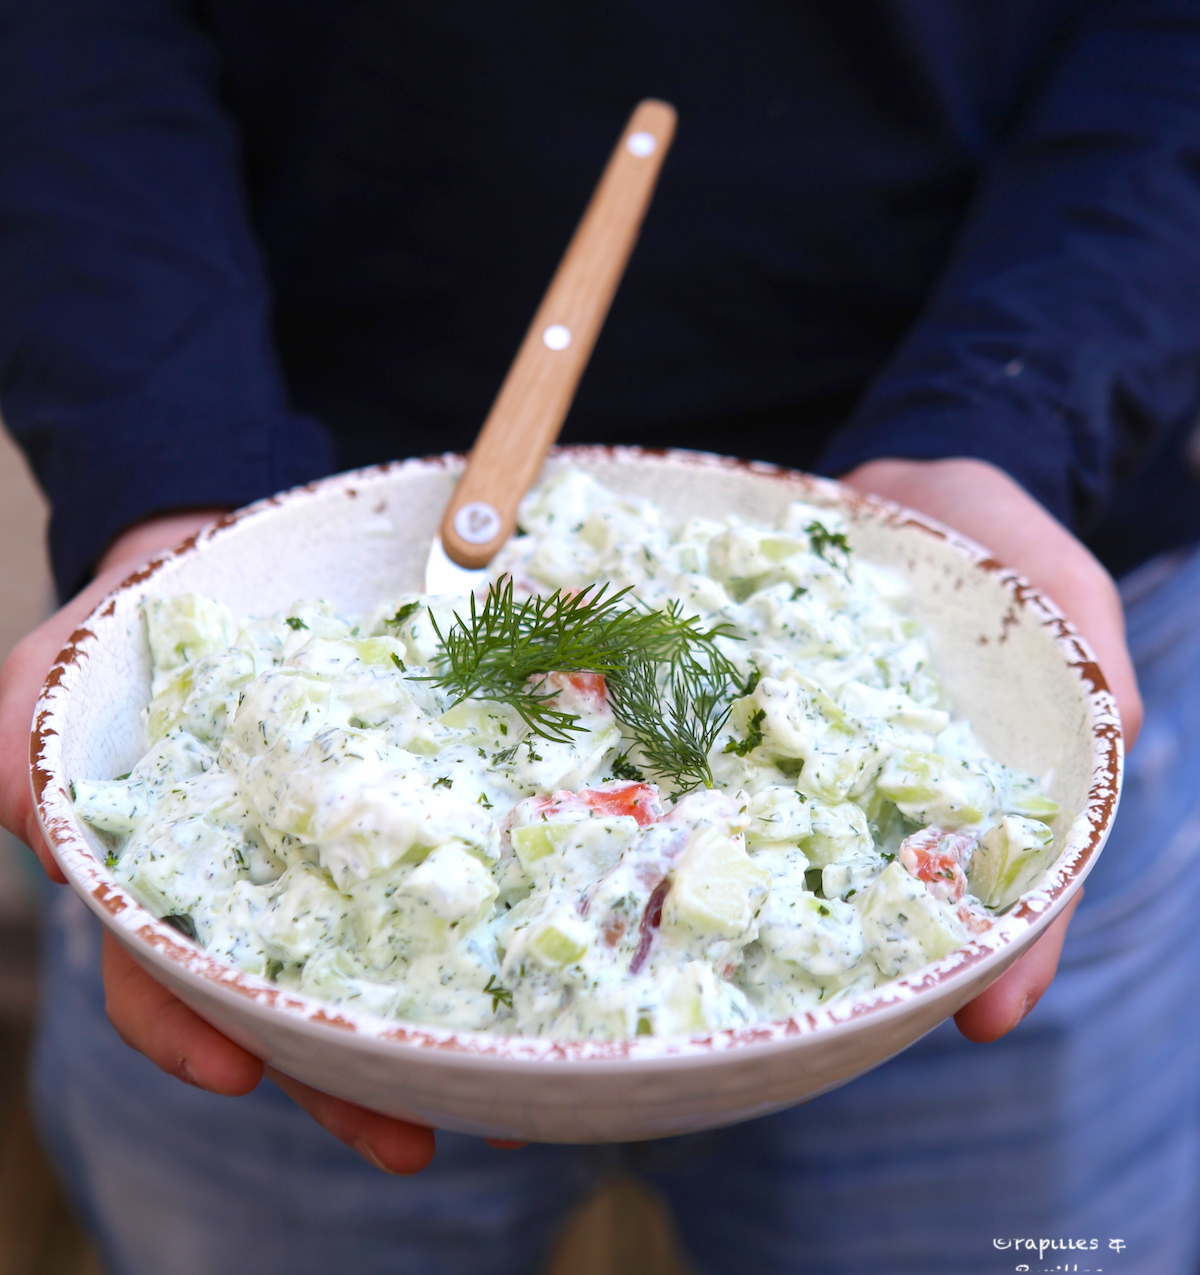 Salade de concombre ricotta saumon fumé aneth